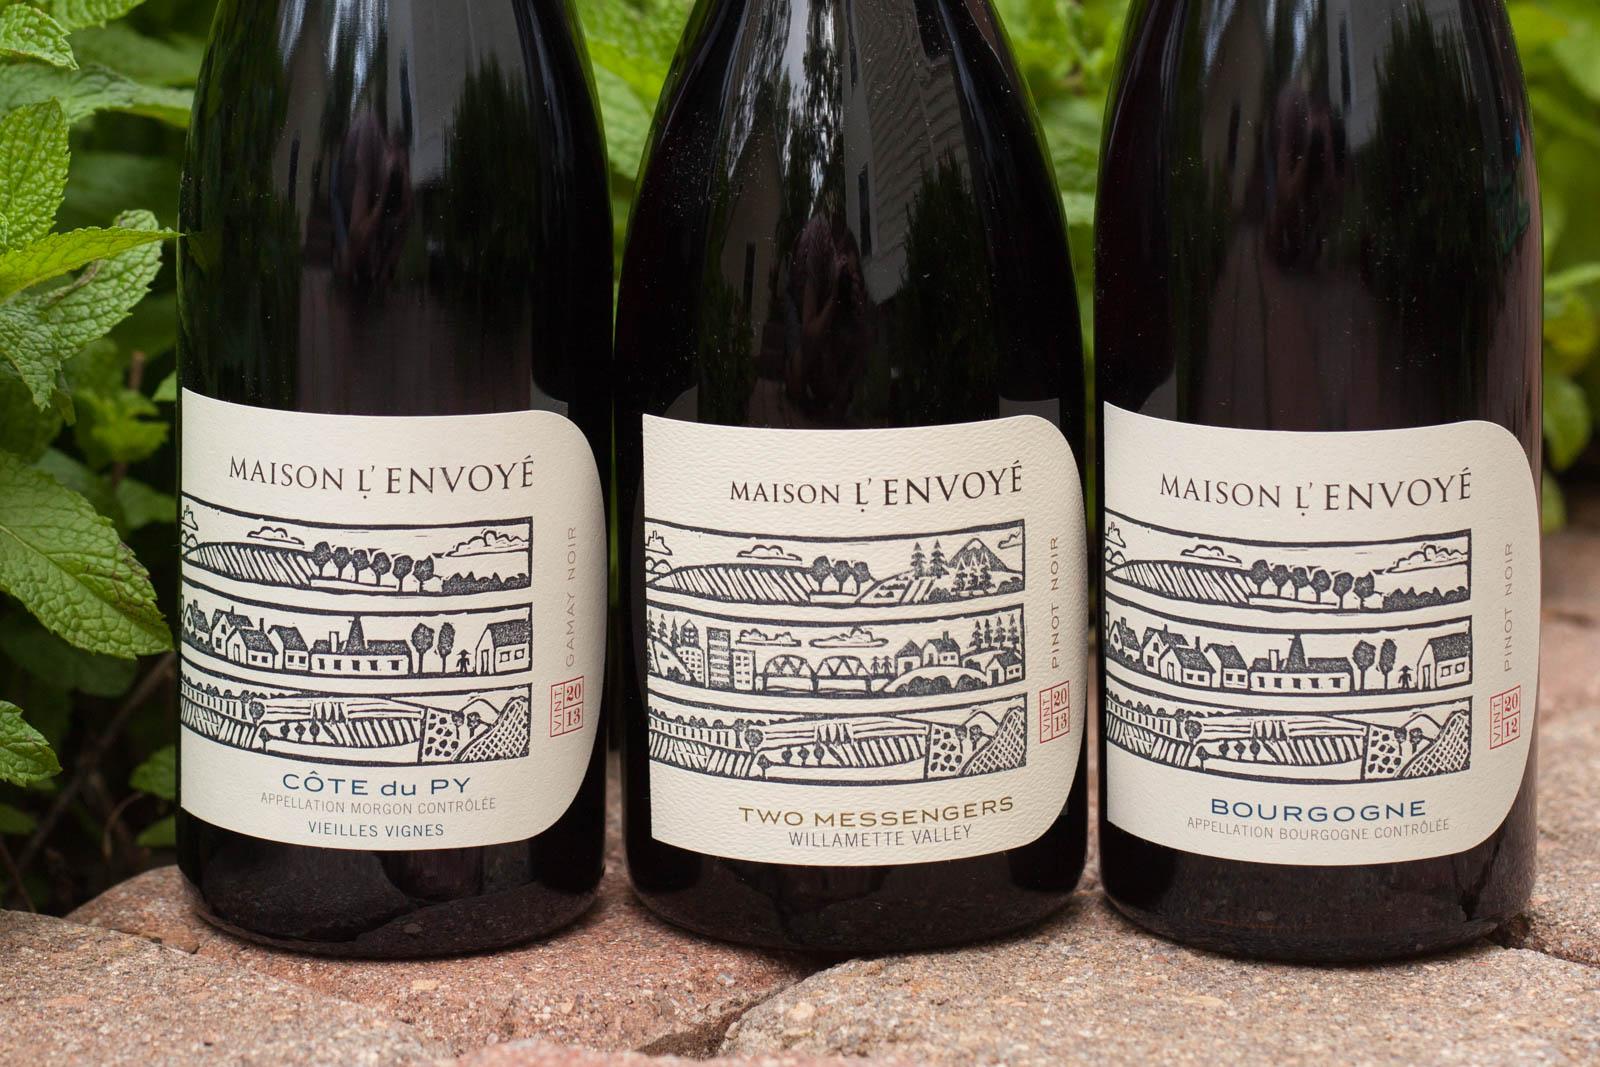 Maison L'Envoye wines